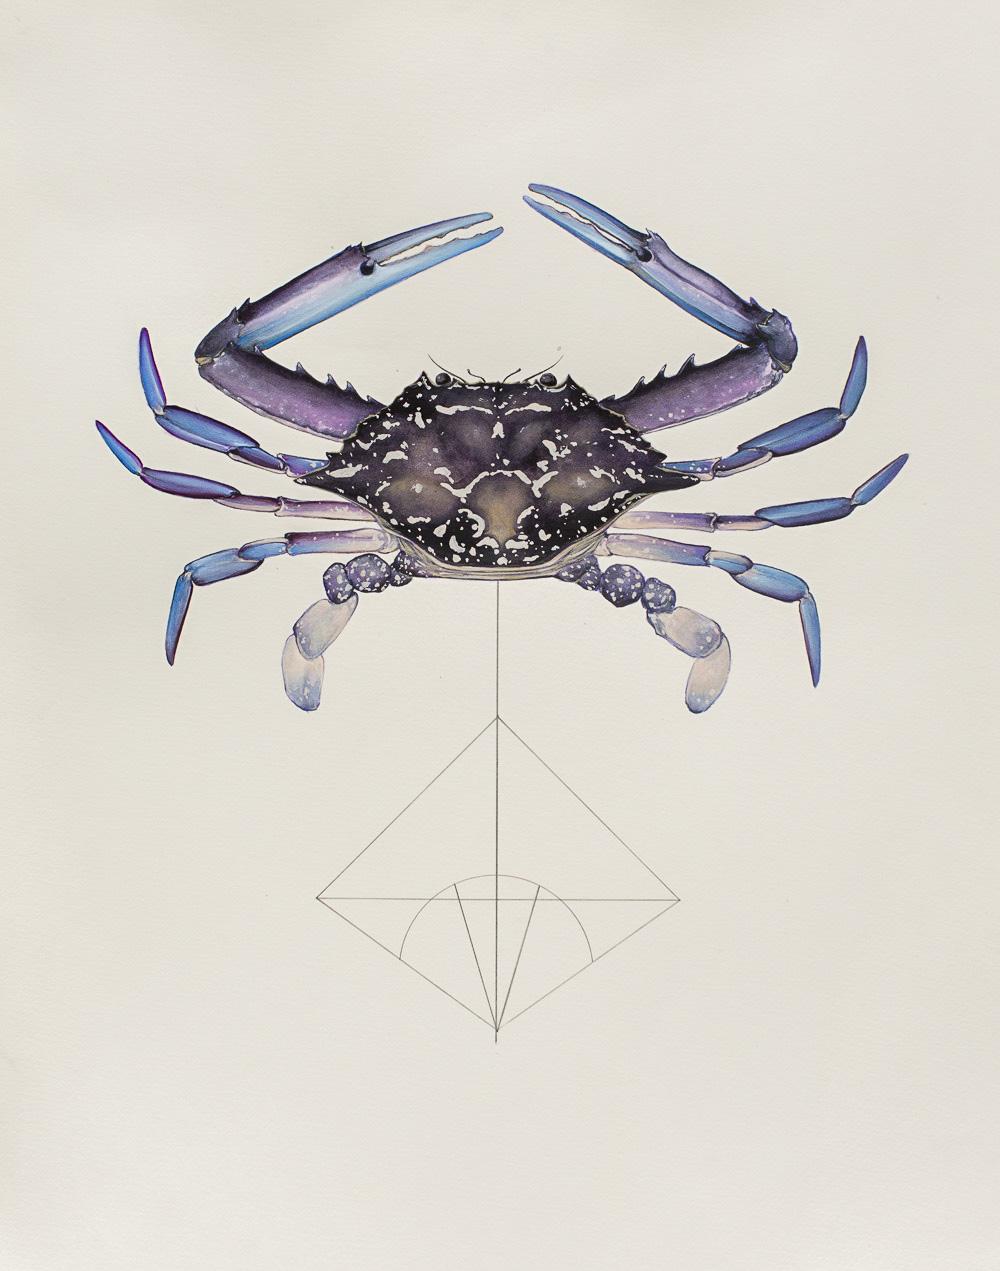 Thomas-Jackson---Entomology_Portunus-pelagicus_400x500.JPG